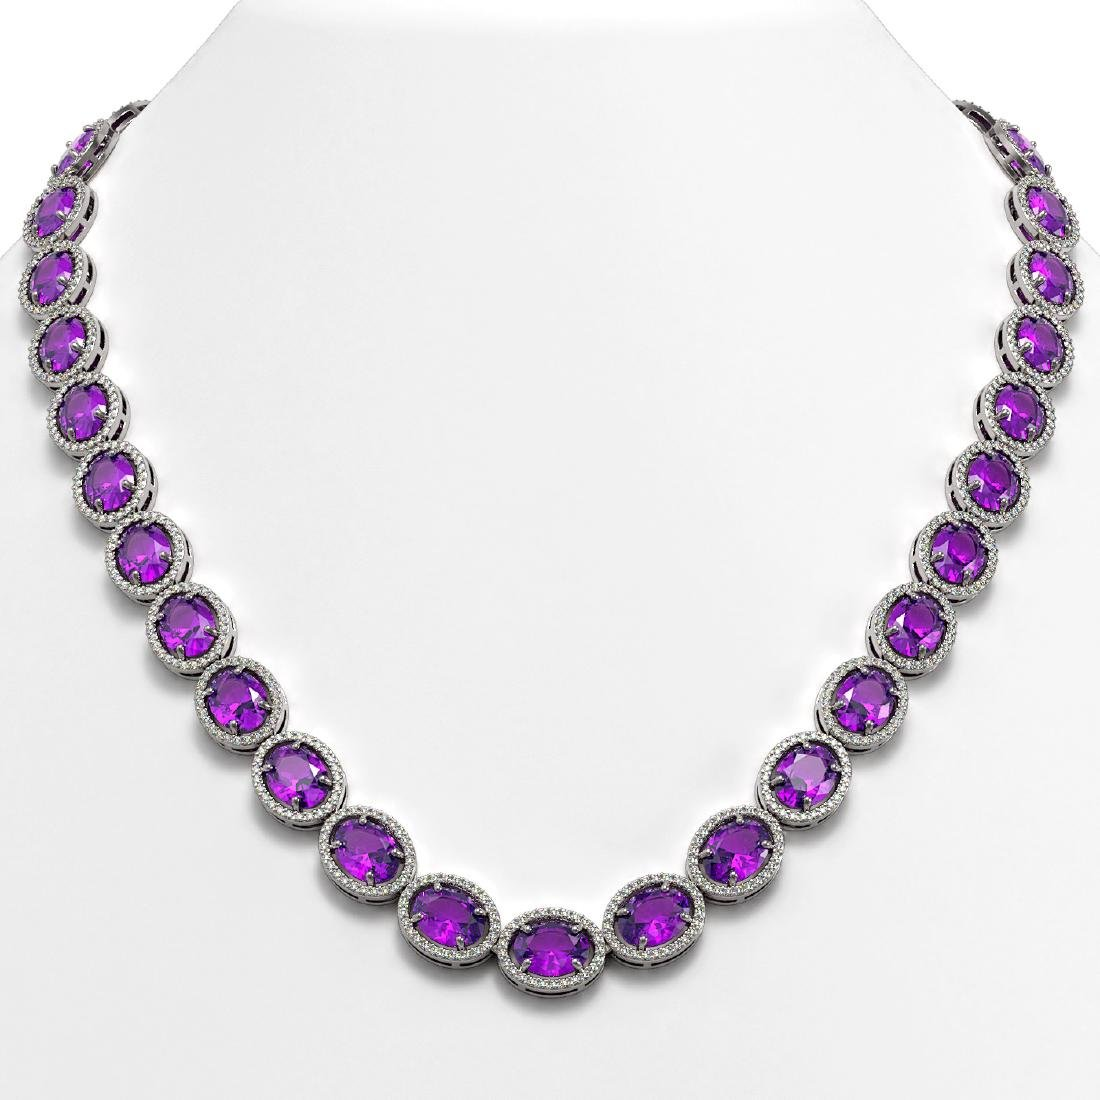 57.07 CTW Amethyst & Diamond Halo Necklace 10K White